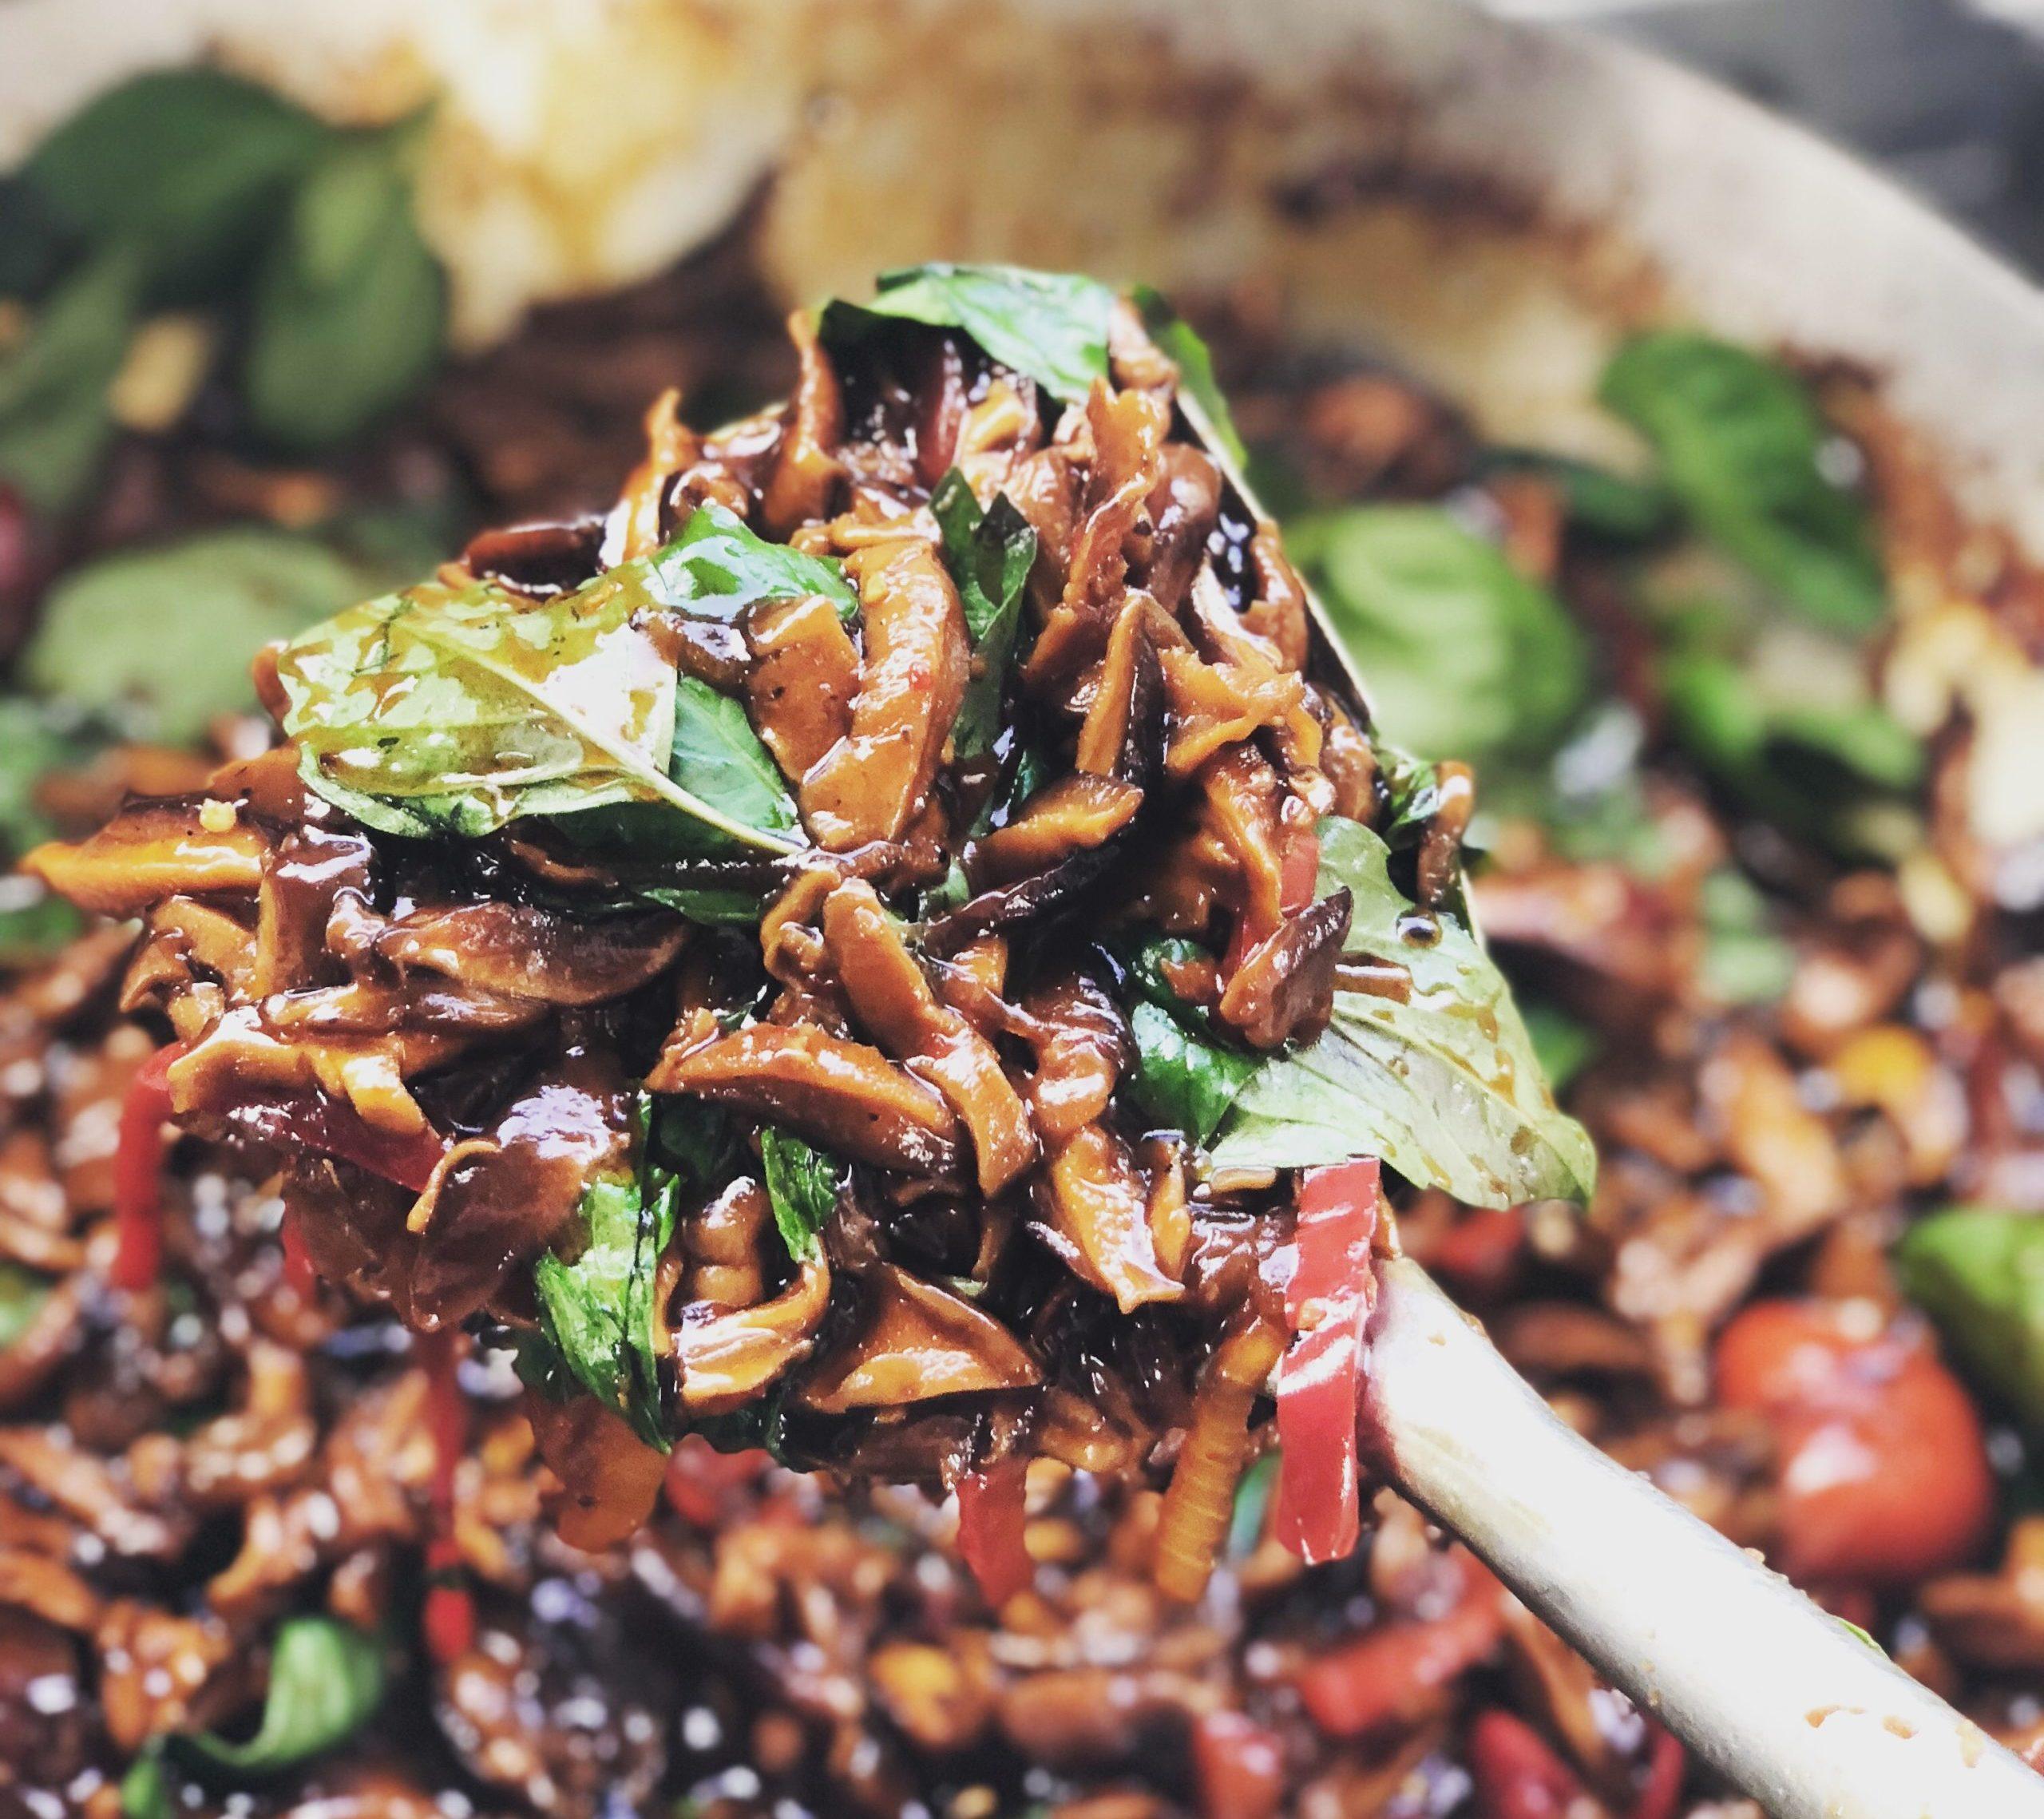 warung roadside thai food truck shiitake holy basil stir fry